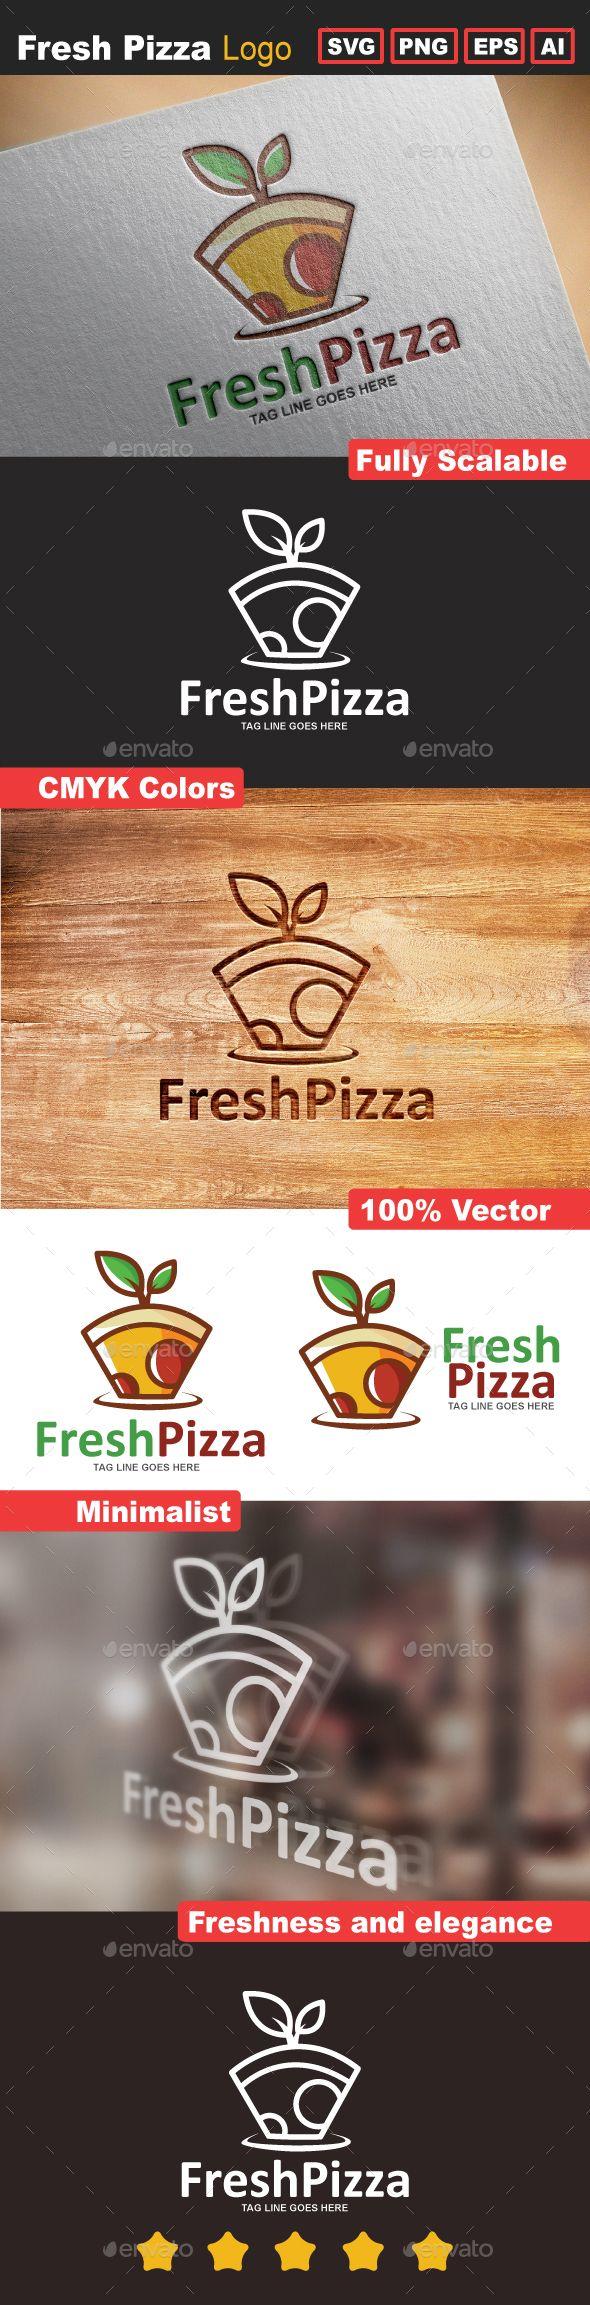 Fresh Pizza Logo Template - Food Logo Templates